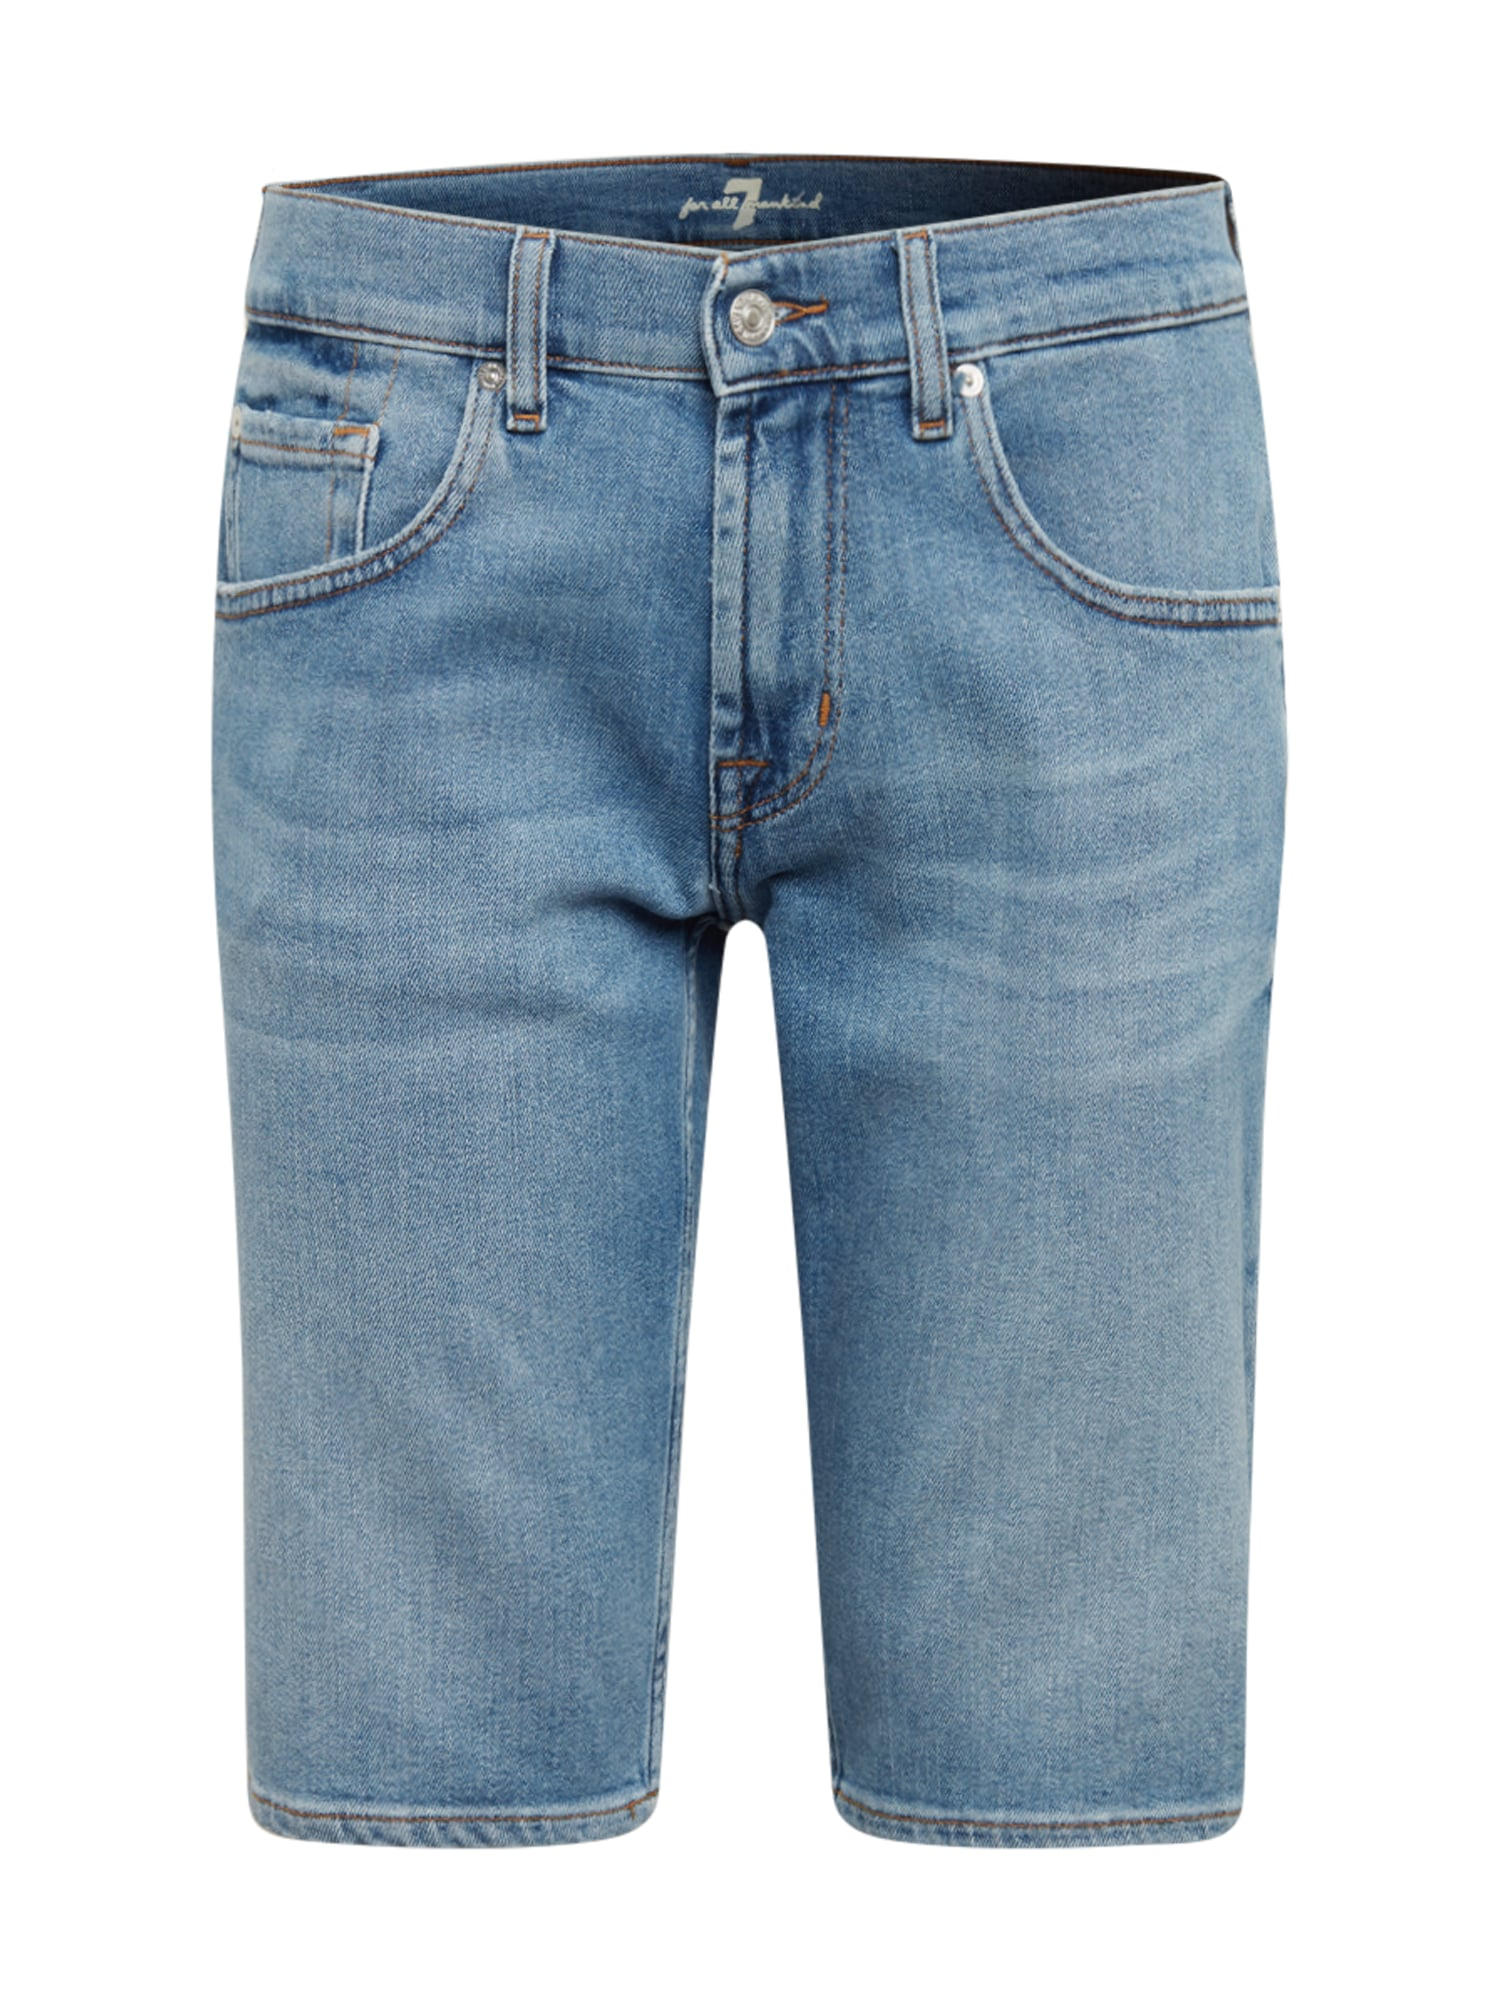 7 for all mankind jean  bleu denim